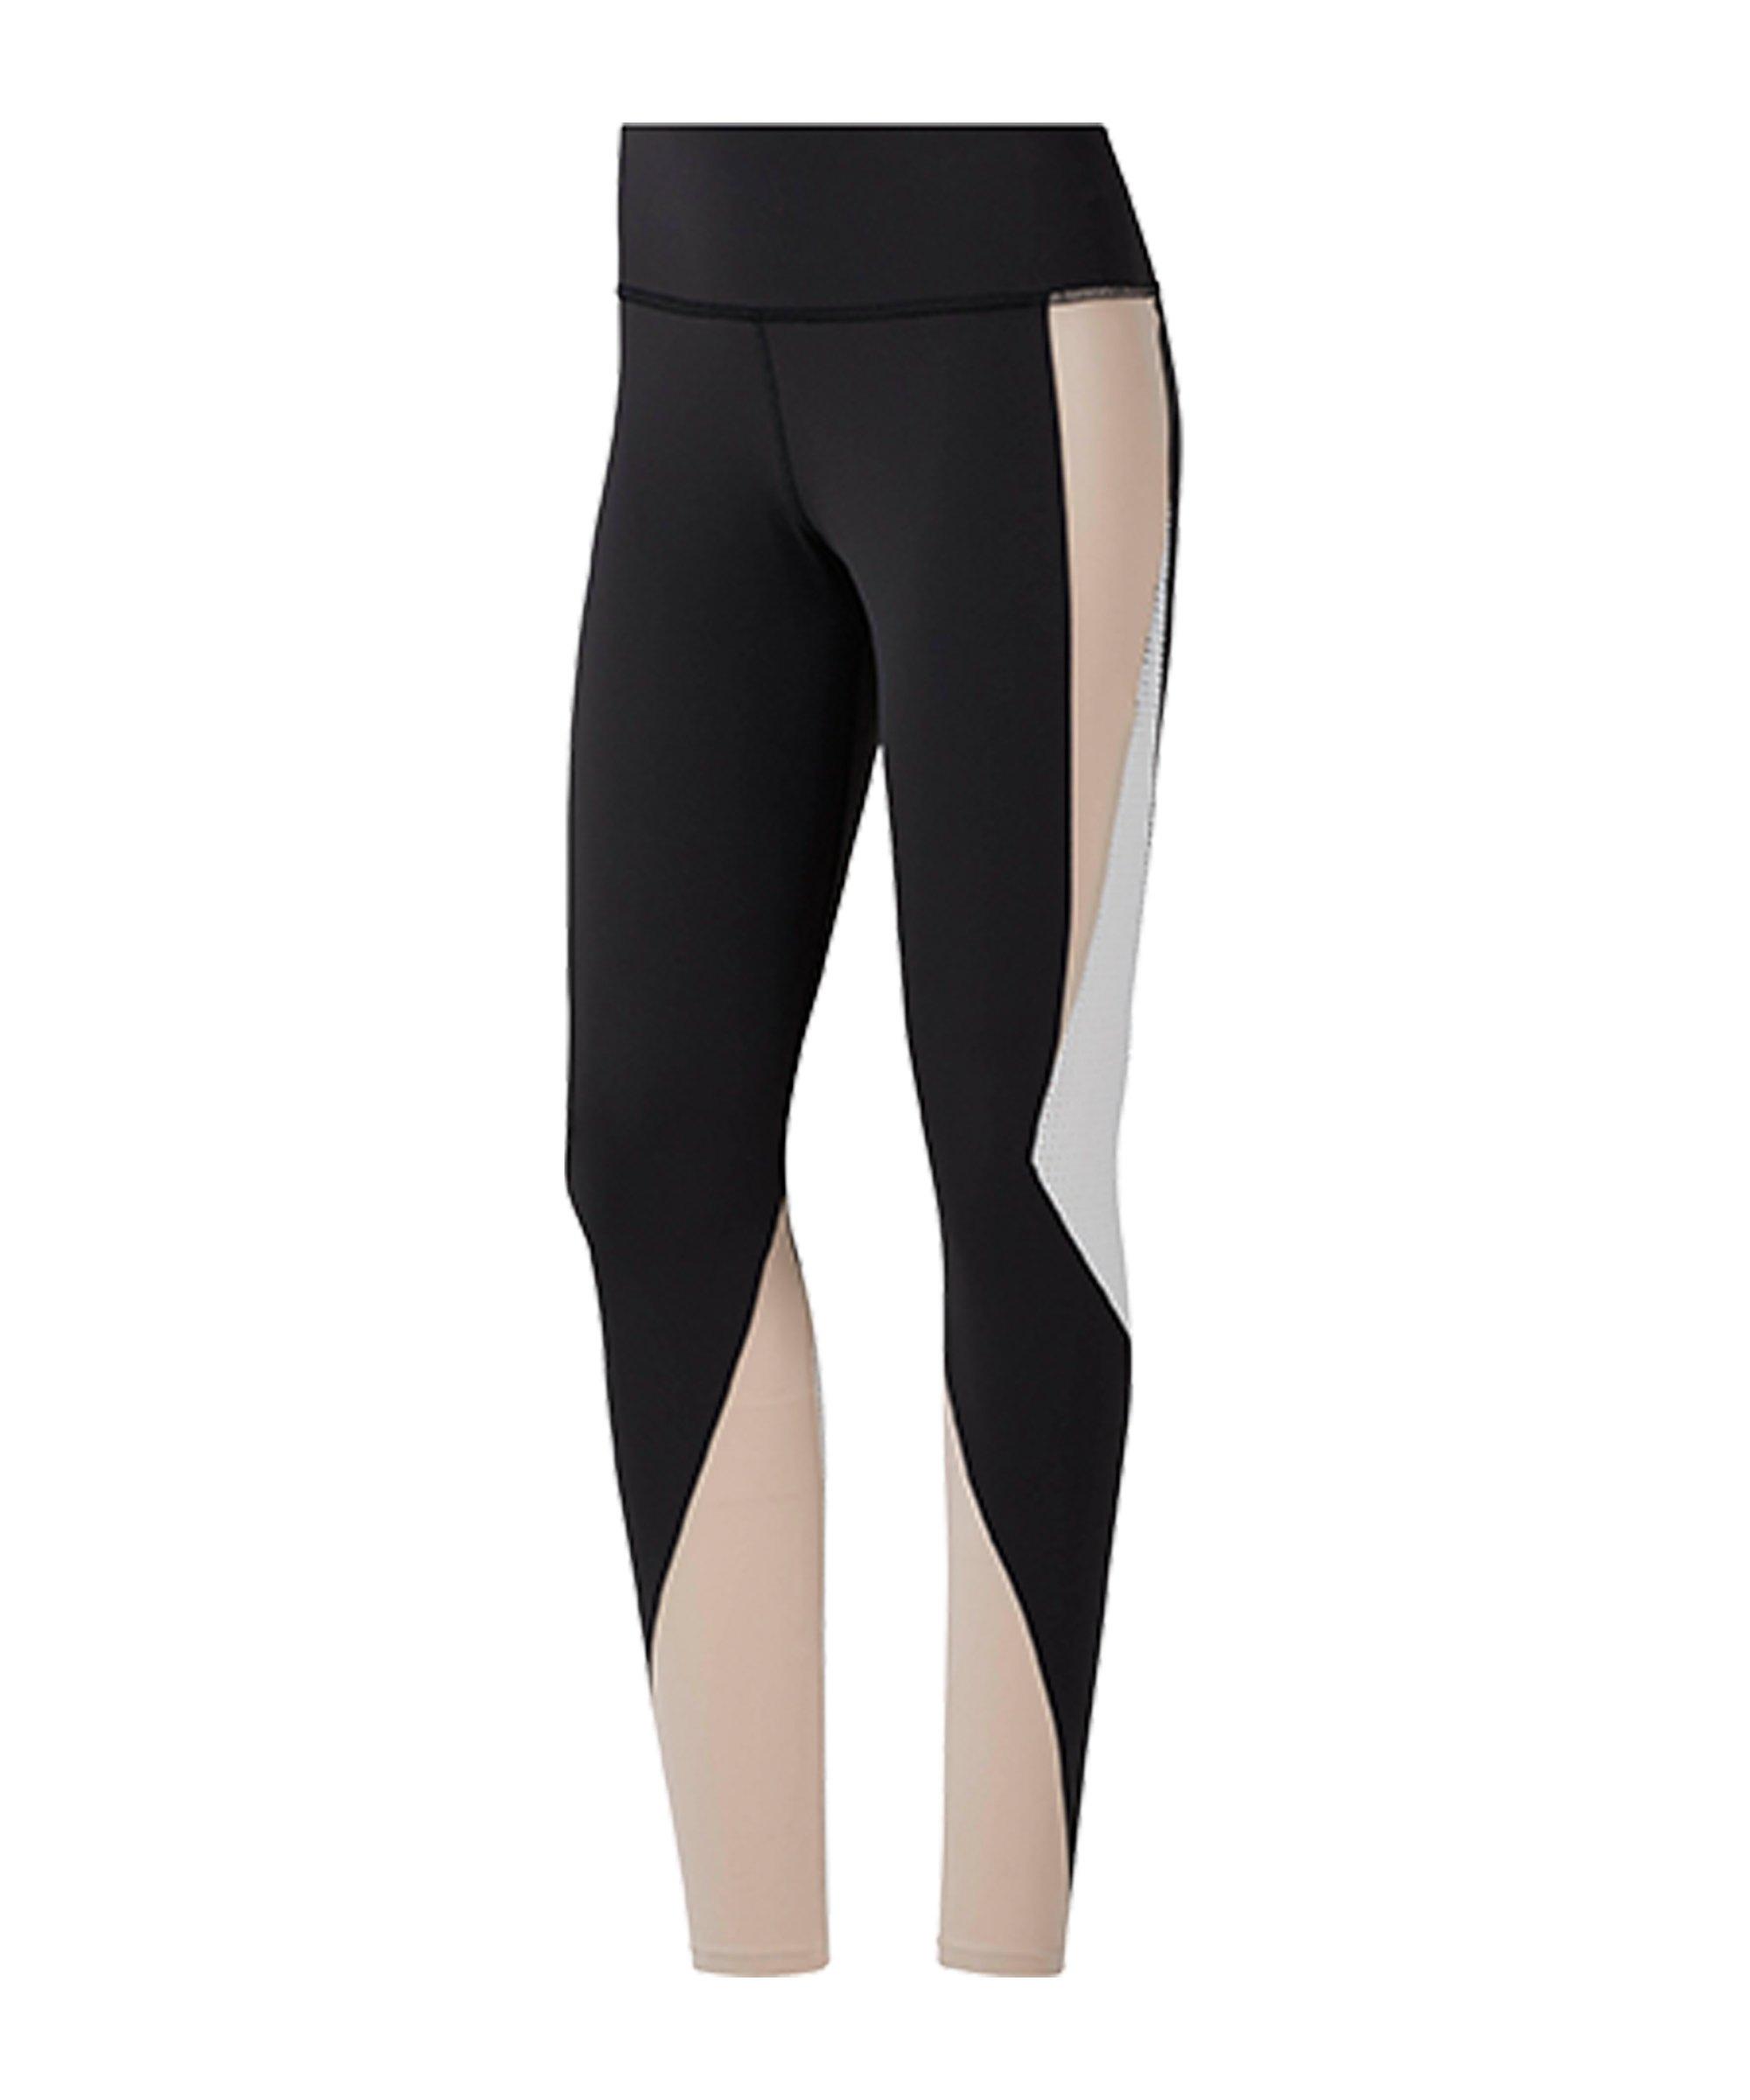 Reebok Lux Thight 2.0 Leggings Damen Schwarz Rosa - schwarz